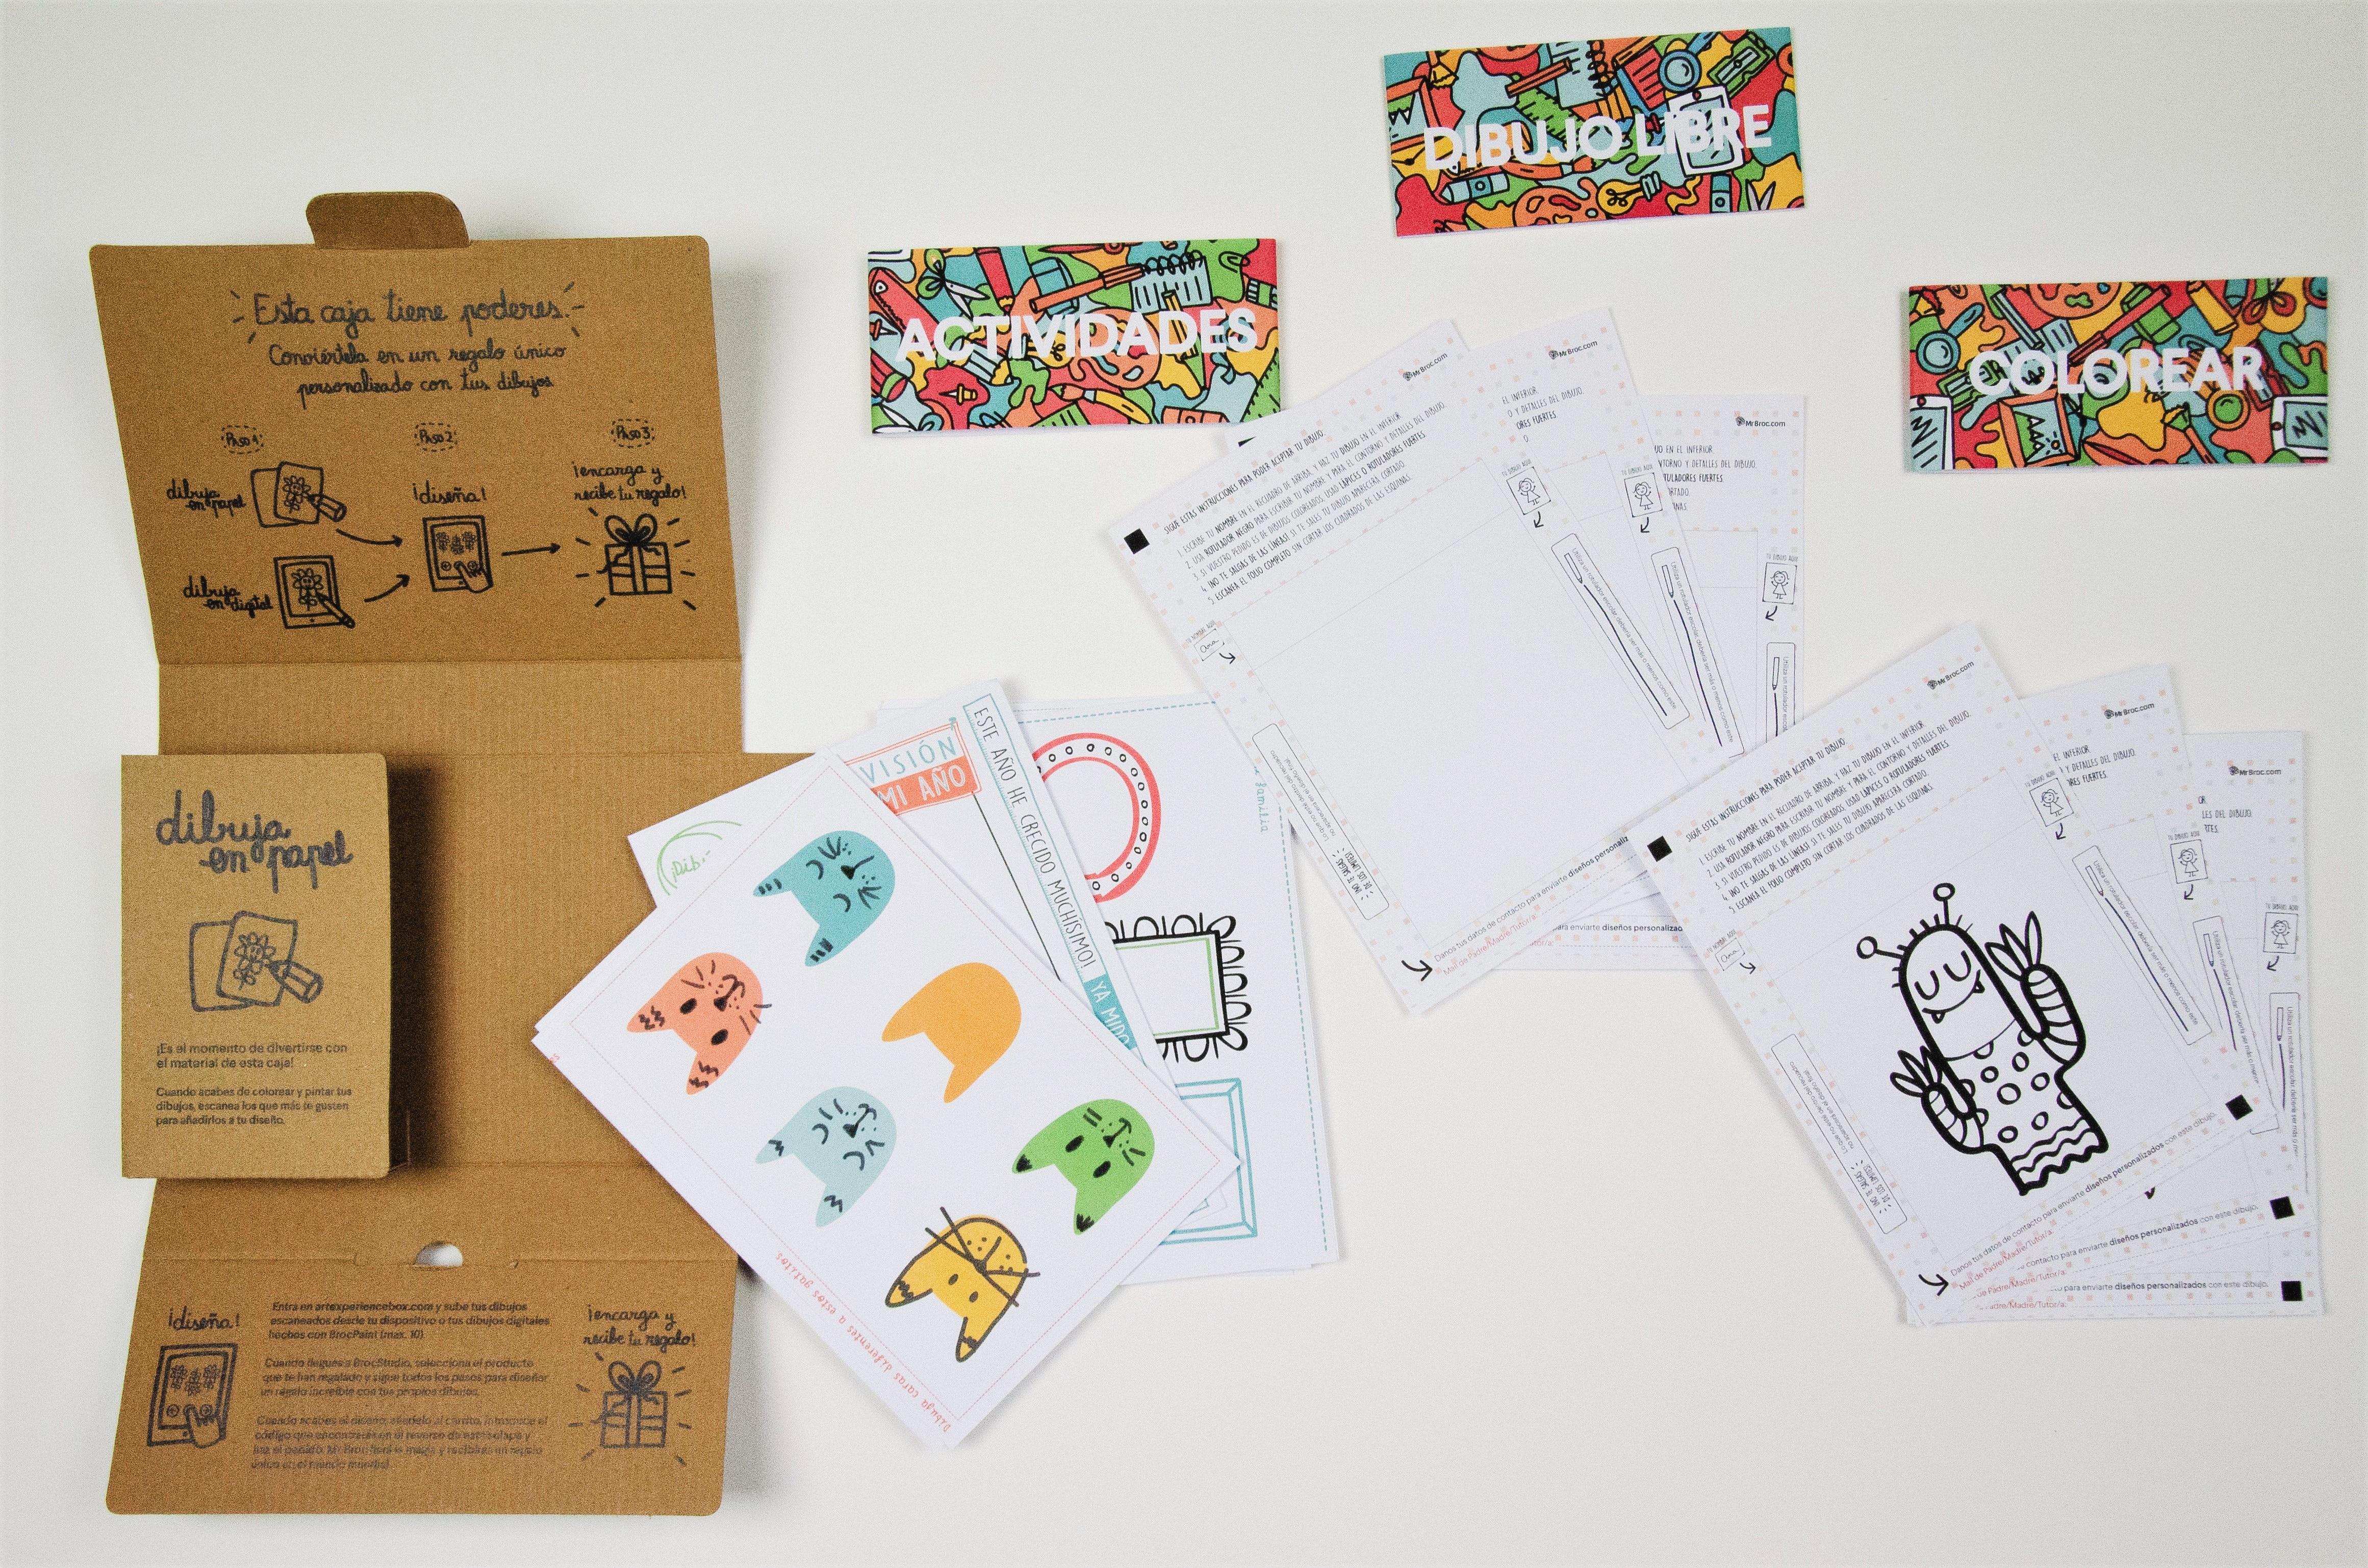 Unboxing the art experience box con todo su material creativo